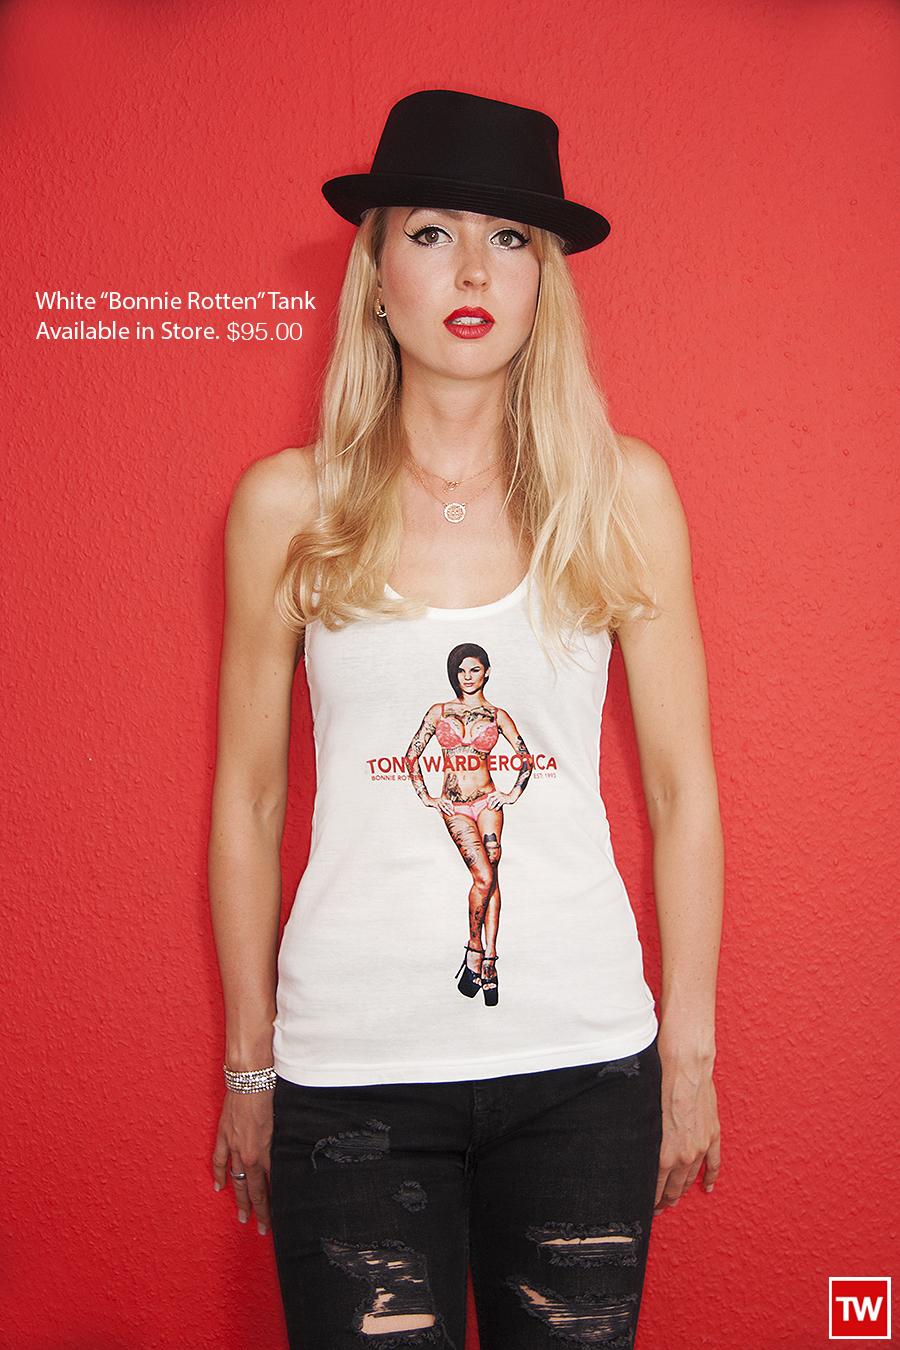 Tony_Ward_erotica_white_Bonnie_Rotten_tank_sexy_porn_wear_style_new_price